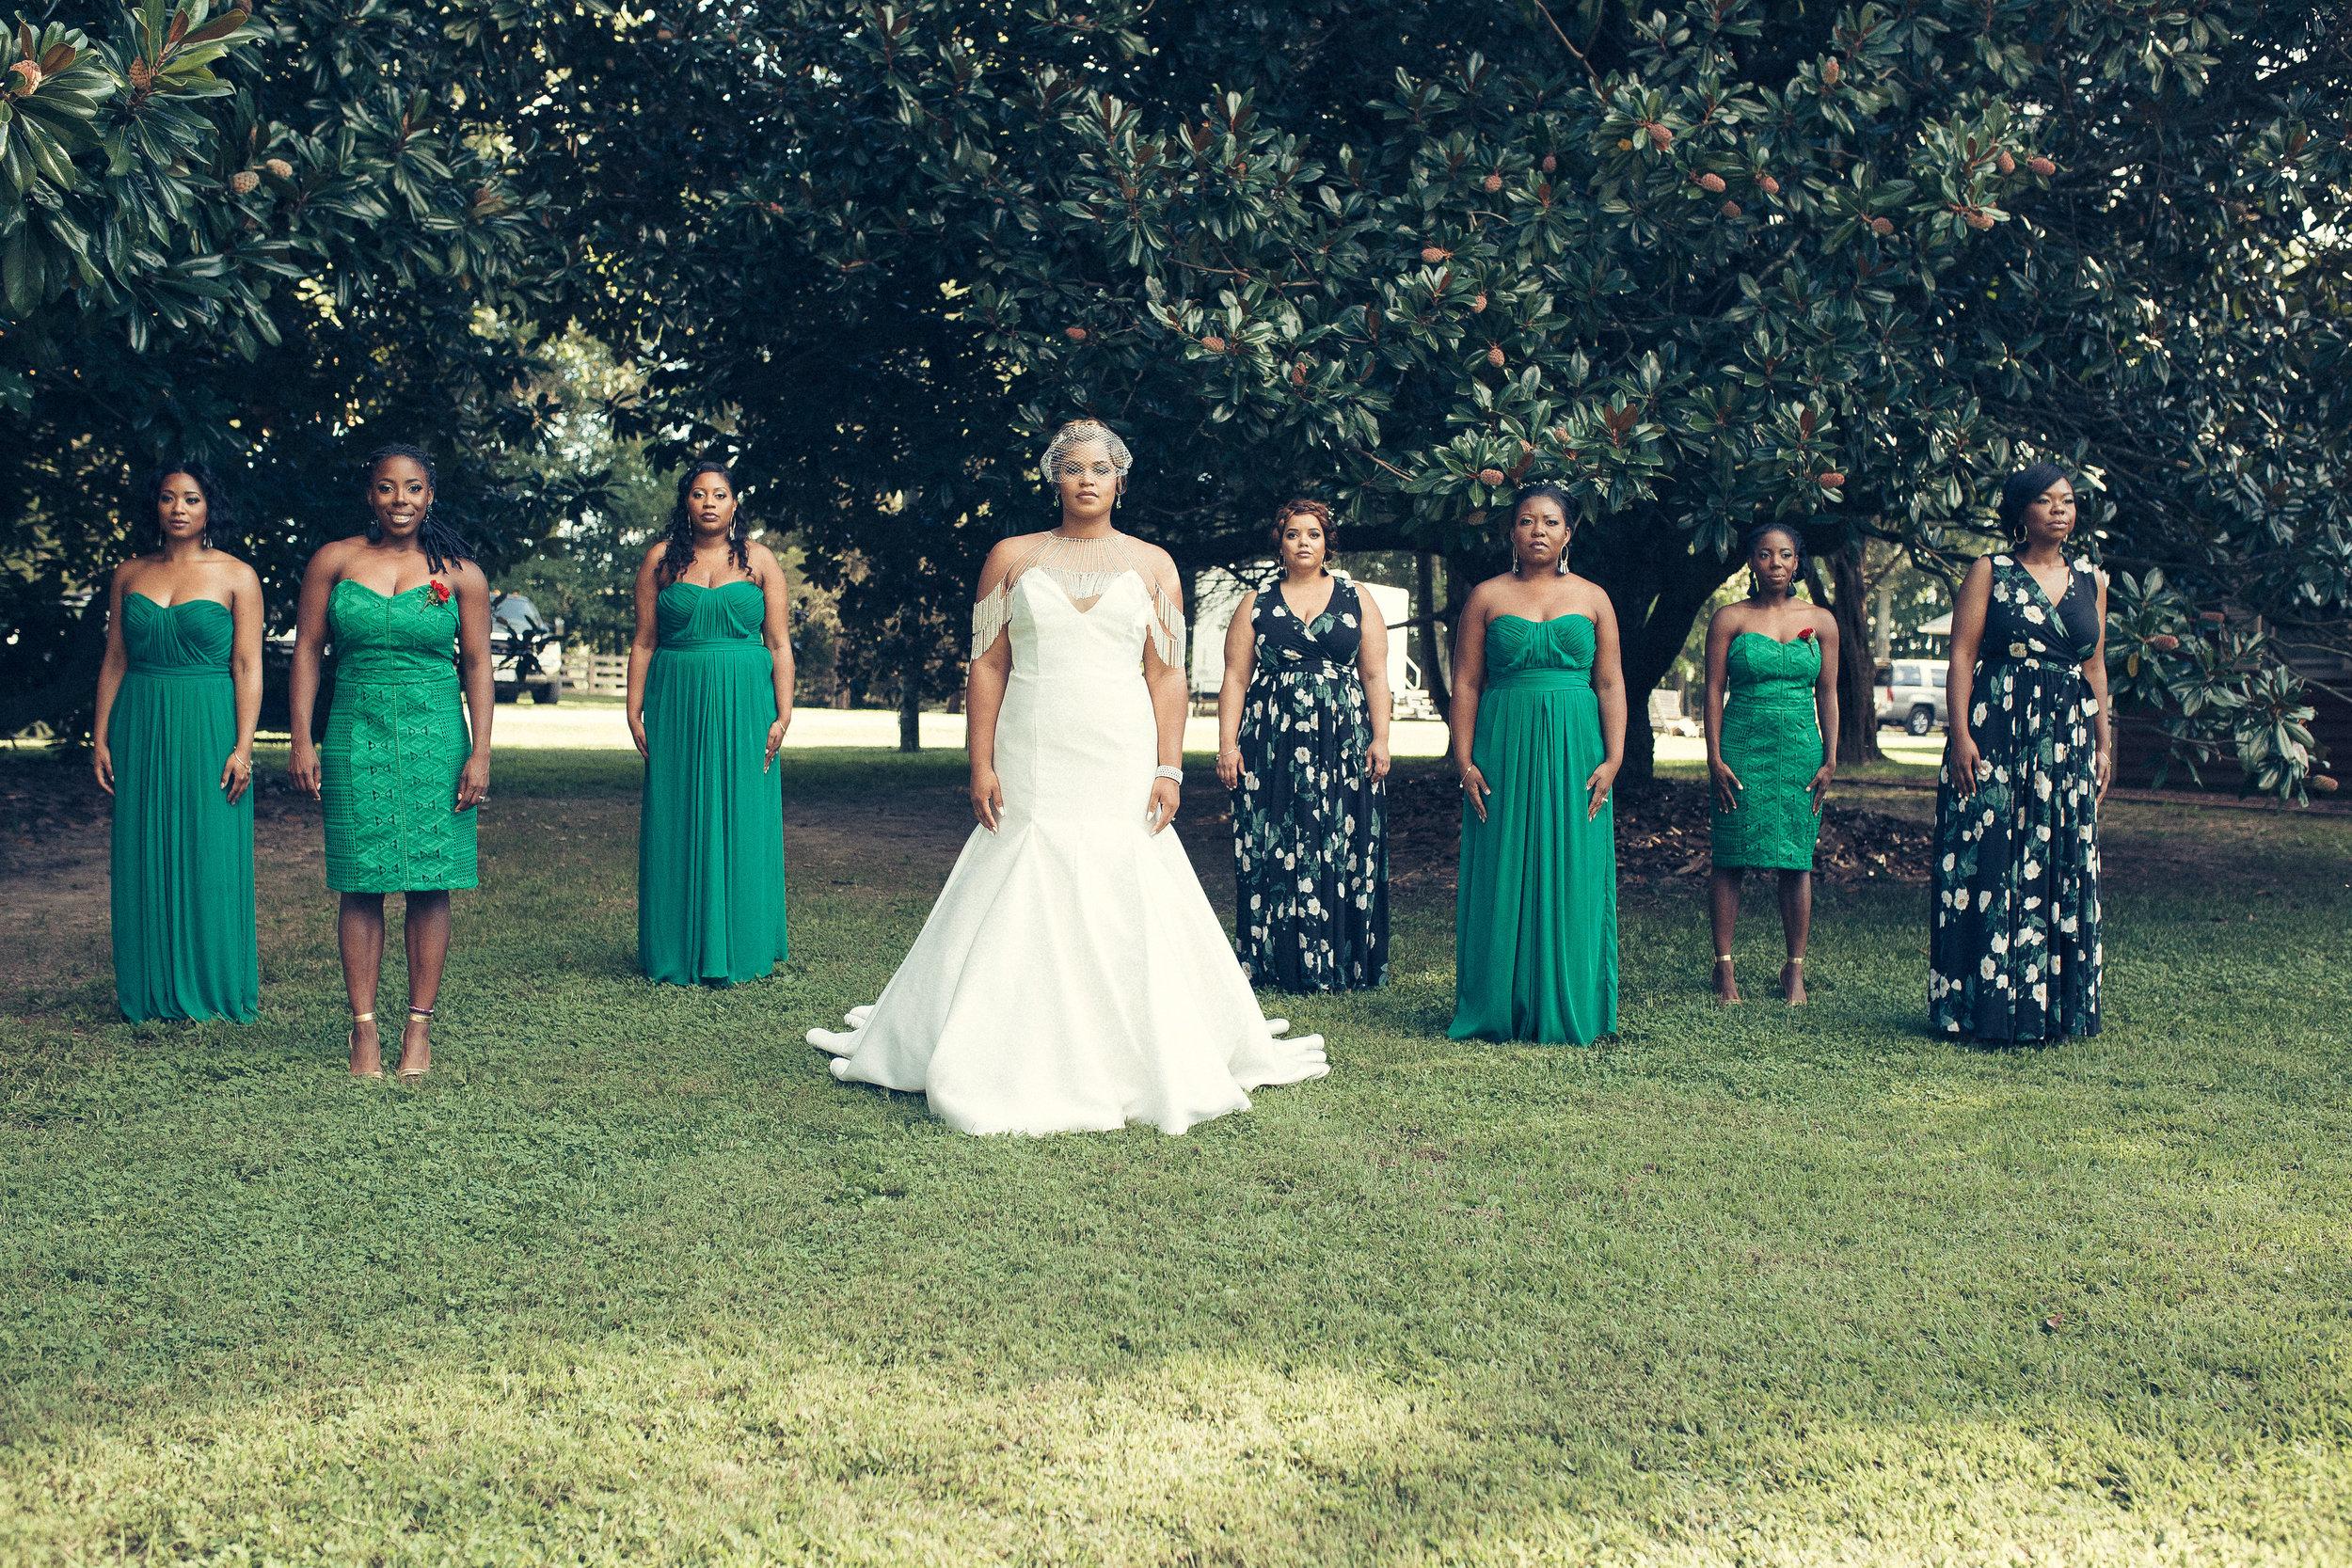 brandon_shannon_wedding-1471.jpg